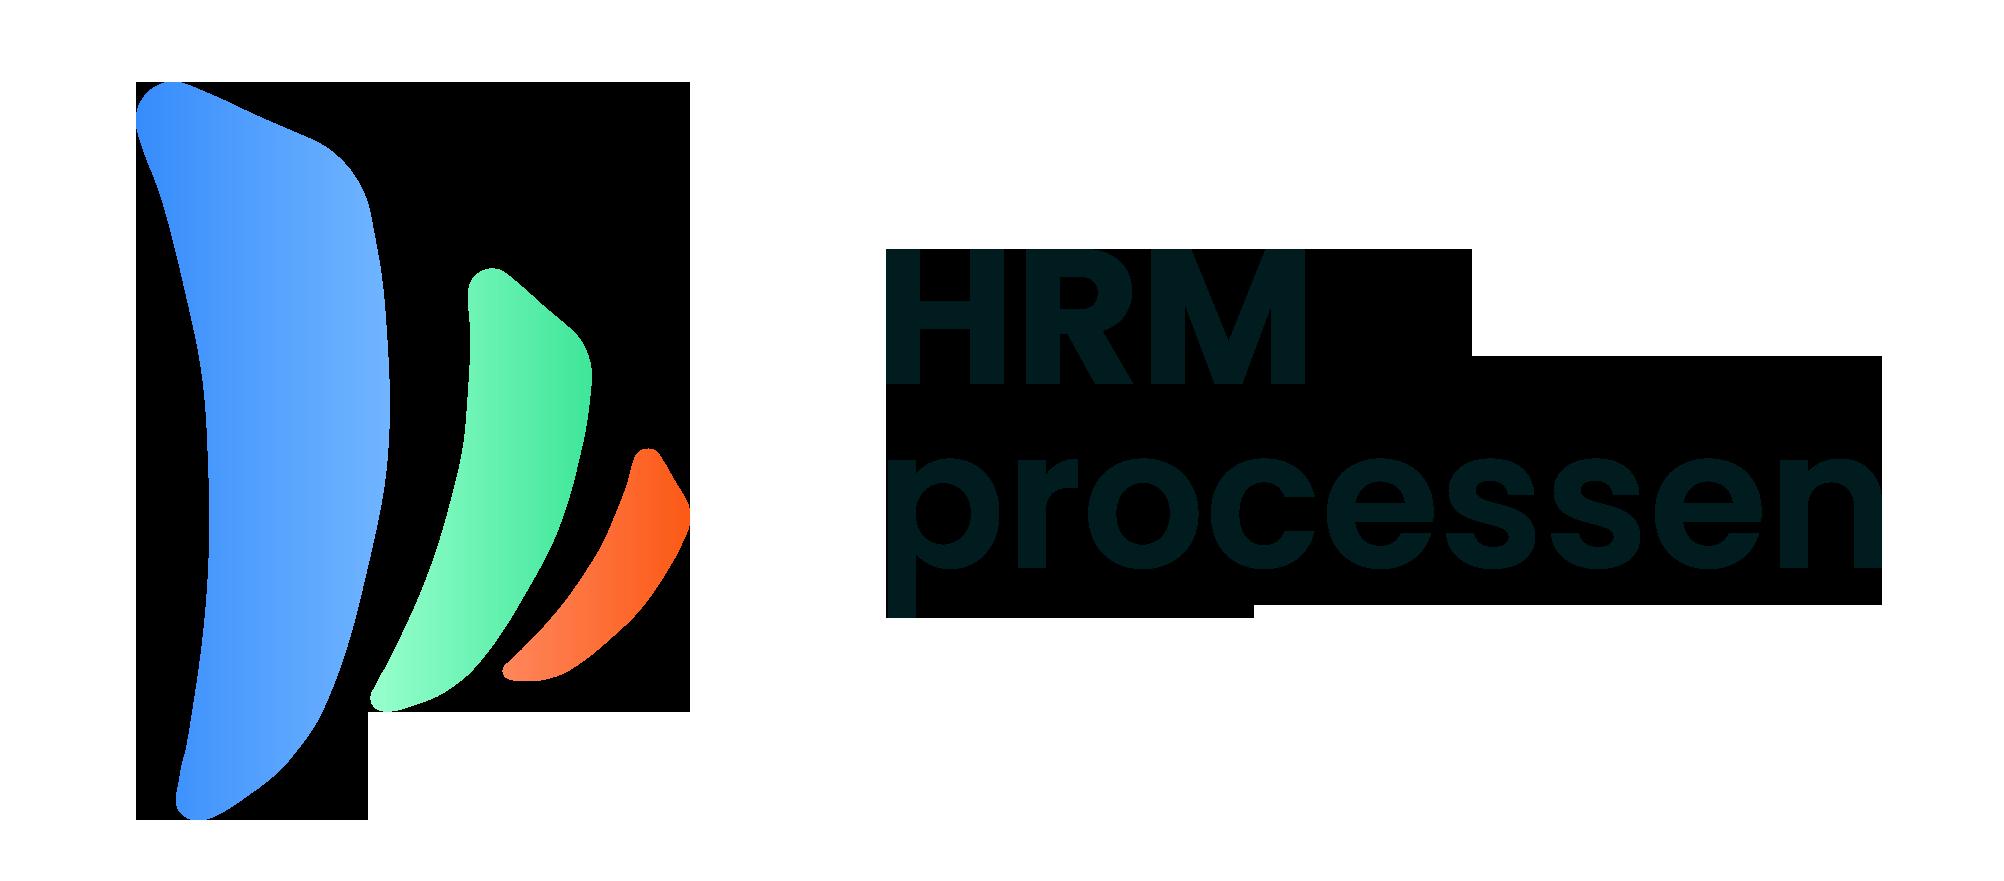 HRM Processen